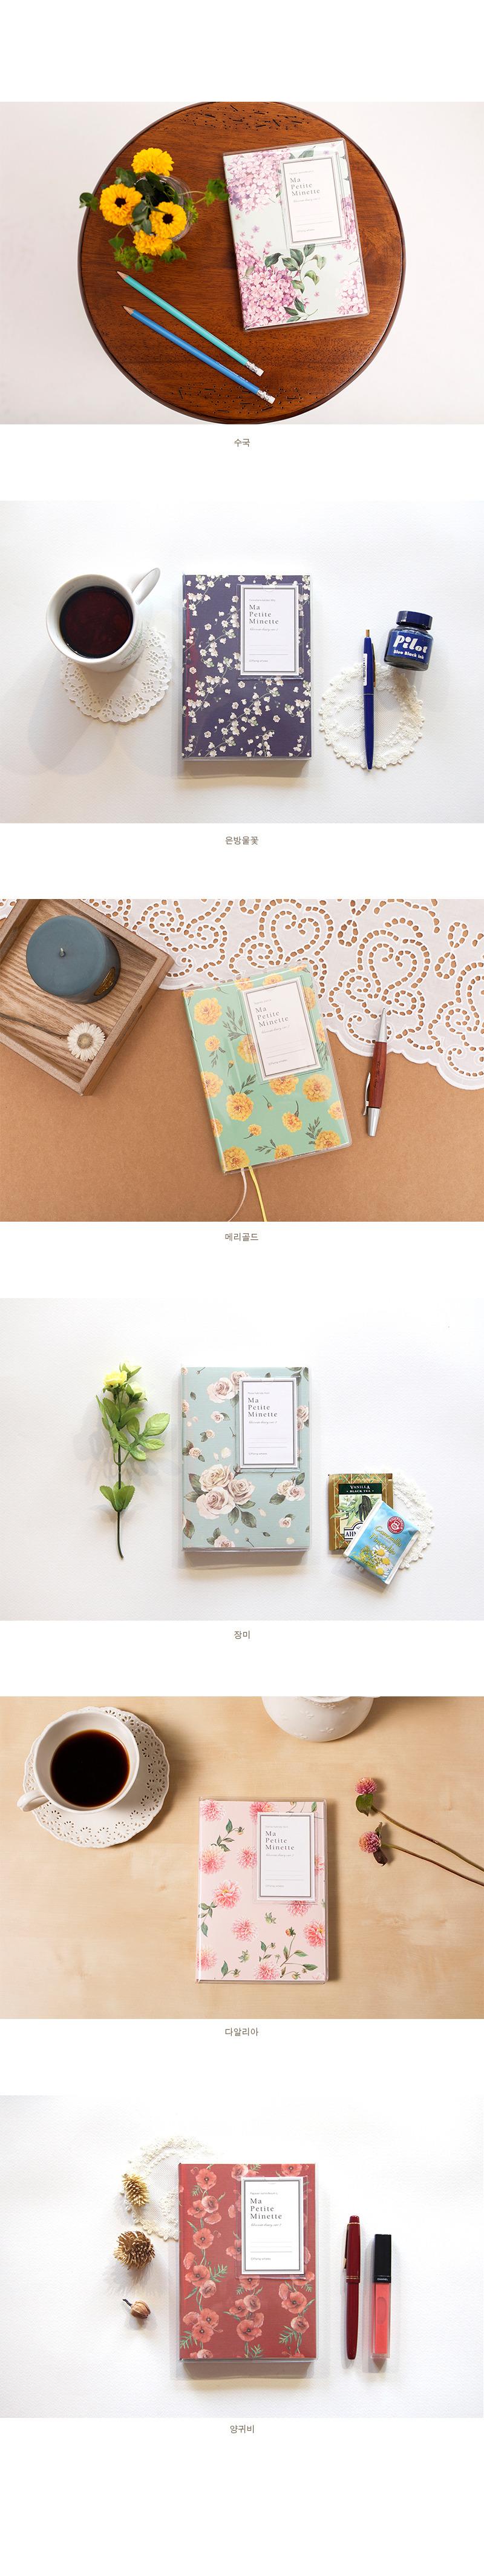 Blossom Diary Ver.2 - 플라잉웨일즈, 10,000원, 만년형, 심플/베이직